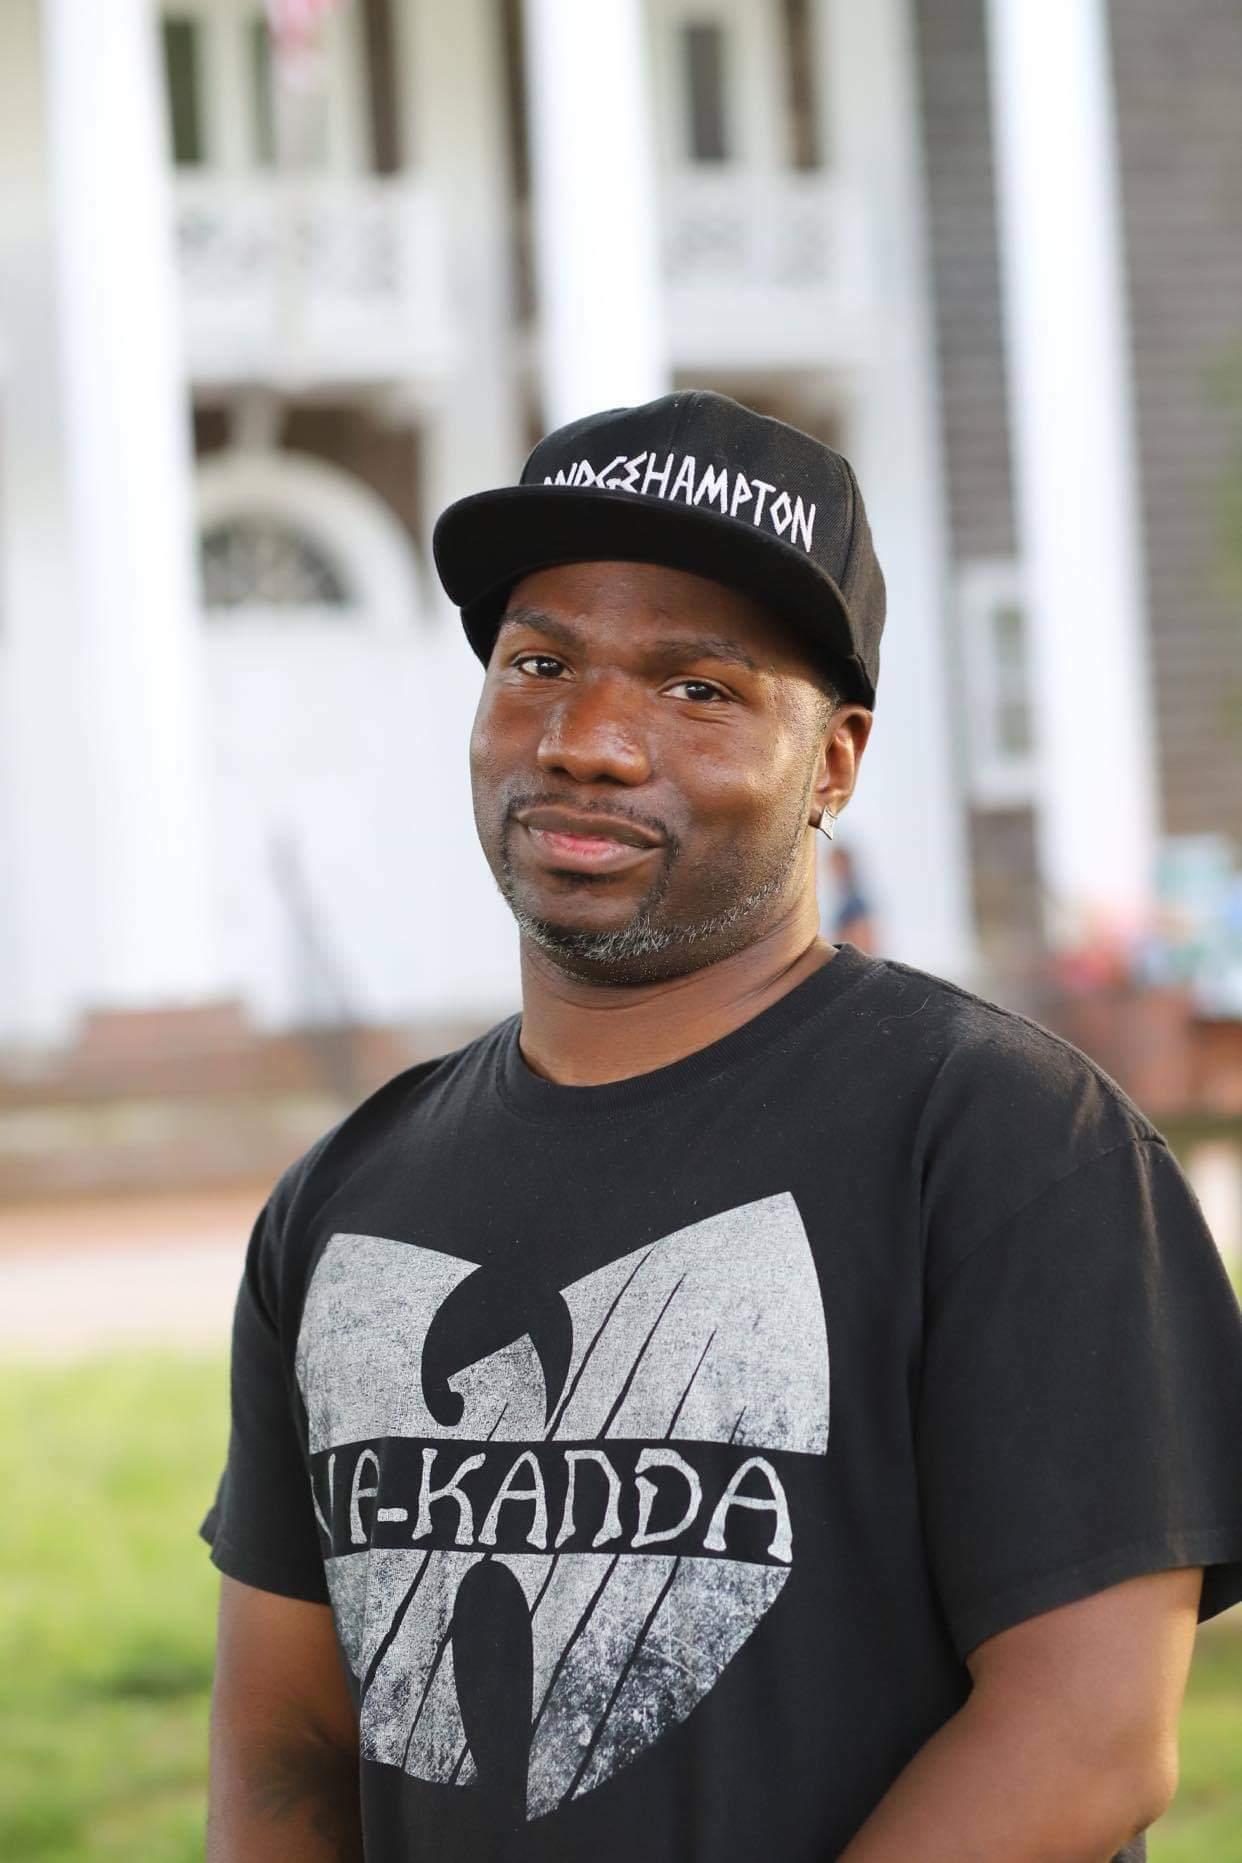 Bridgehampton-based activist Willie Jenkins.